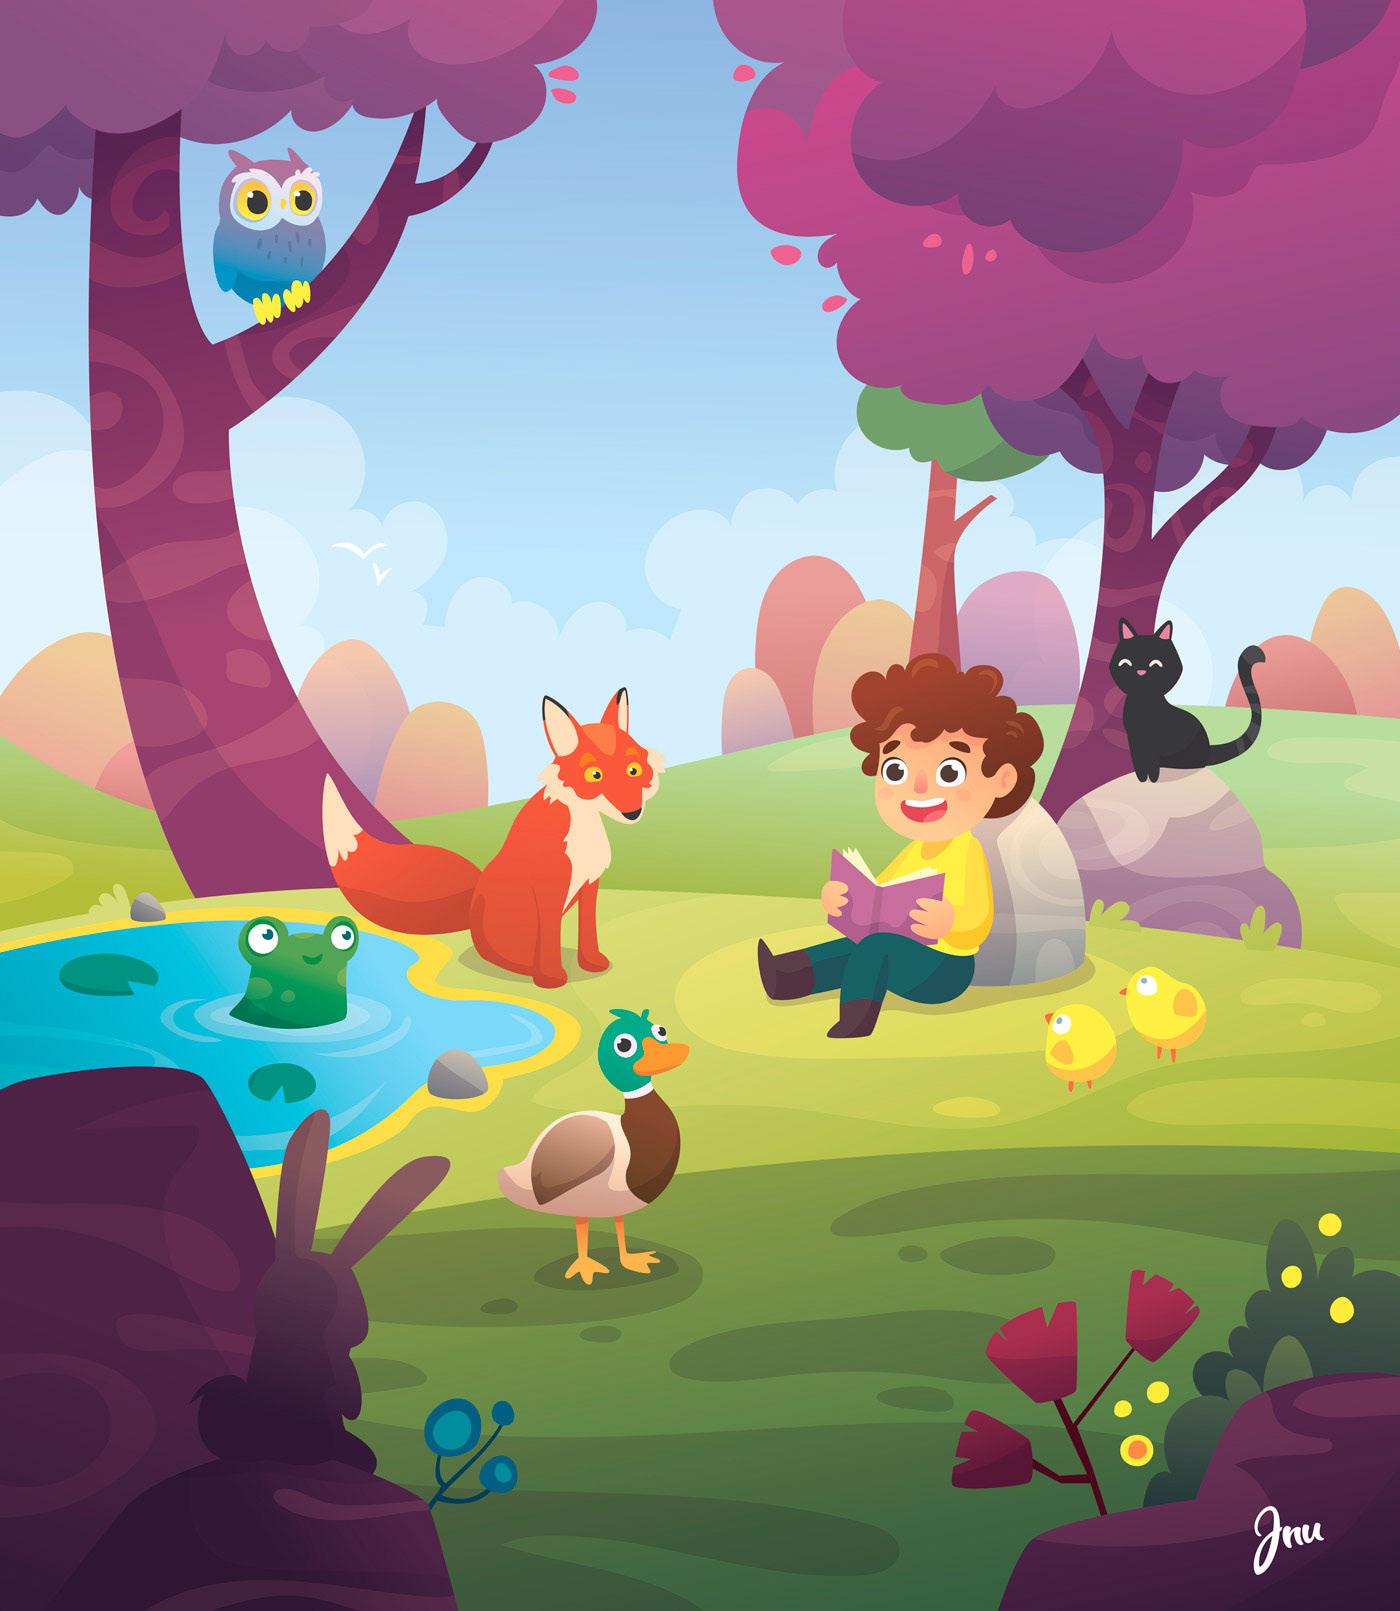 ilustracion infantil arte characters personajes animales kids